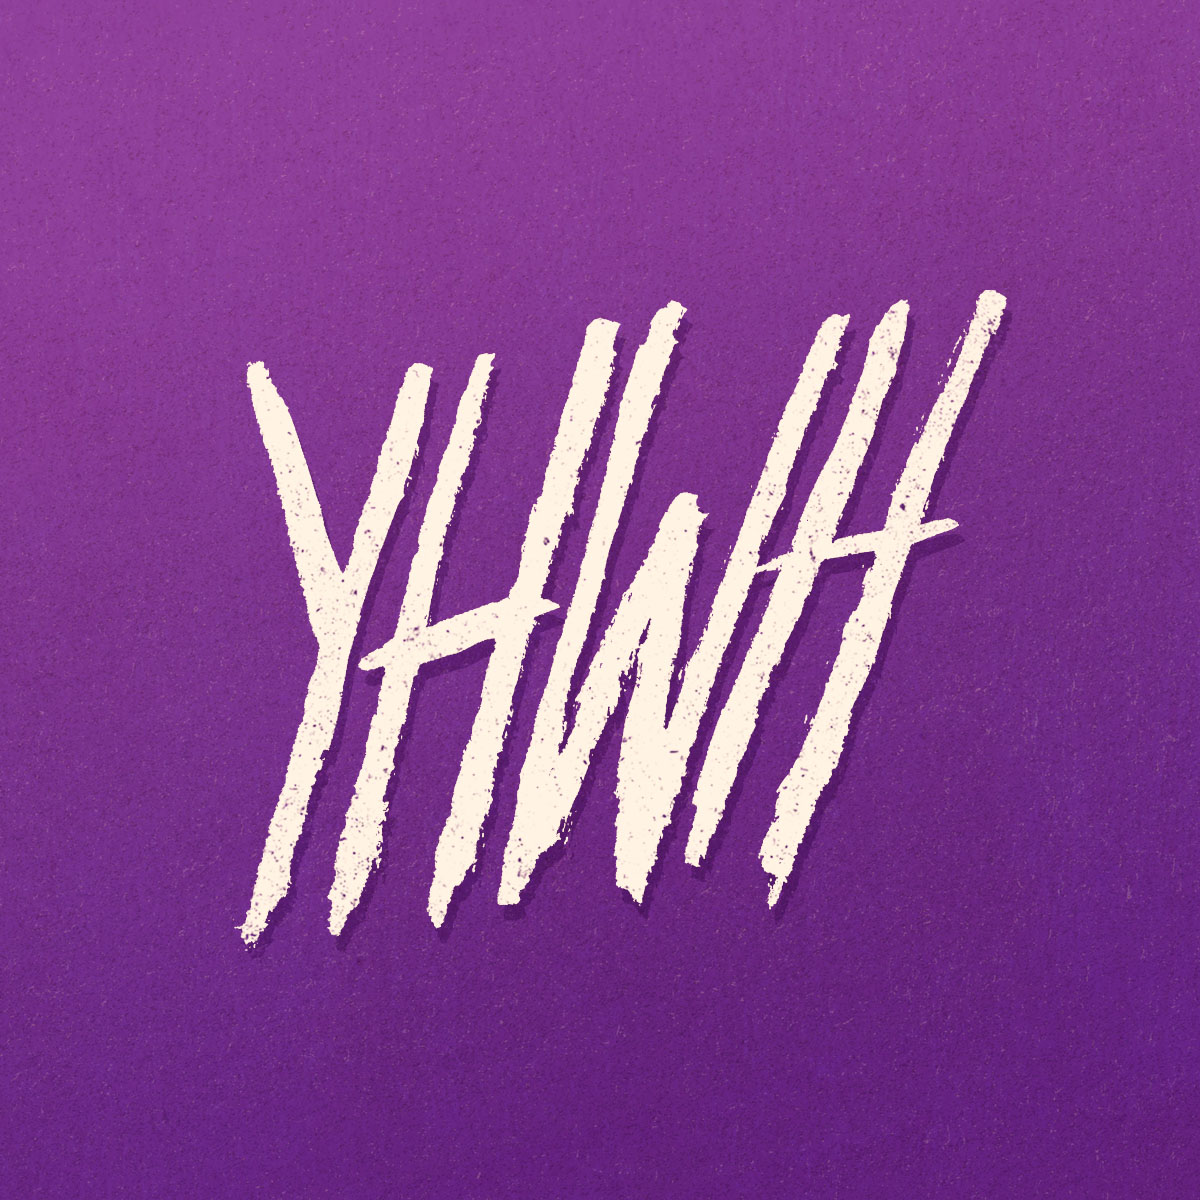 YHWH_1x1_square.jpg